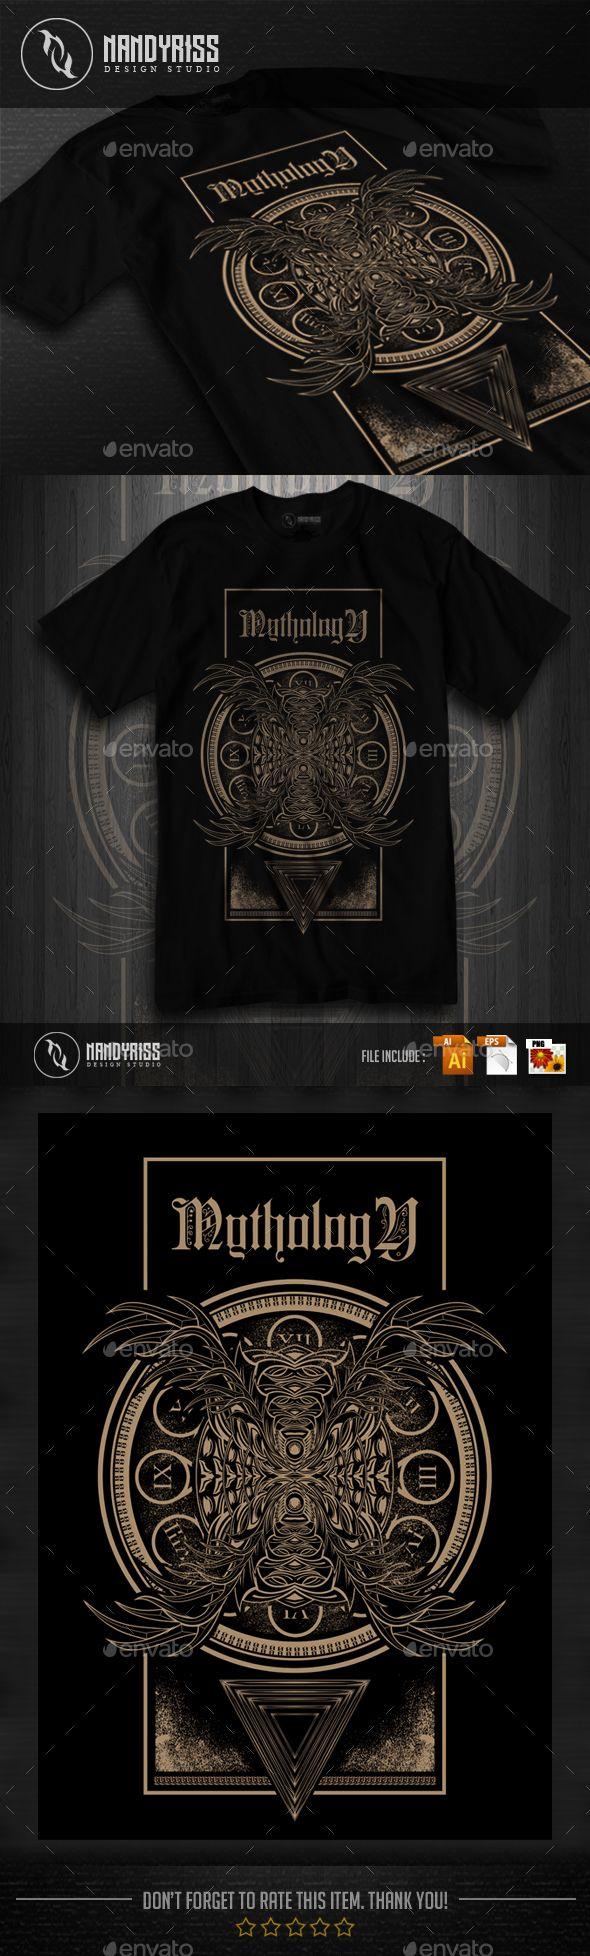 MYTHOLOGY TShirt Design — Vector EPS #sign #dark • Available here → https://graphicriver.net/item/mythology-tshirt-design/17277269?ref=pxcr